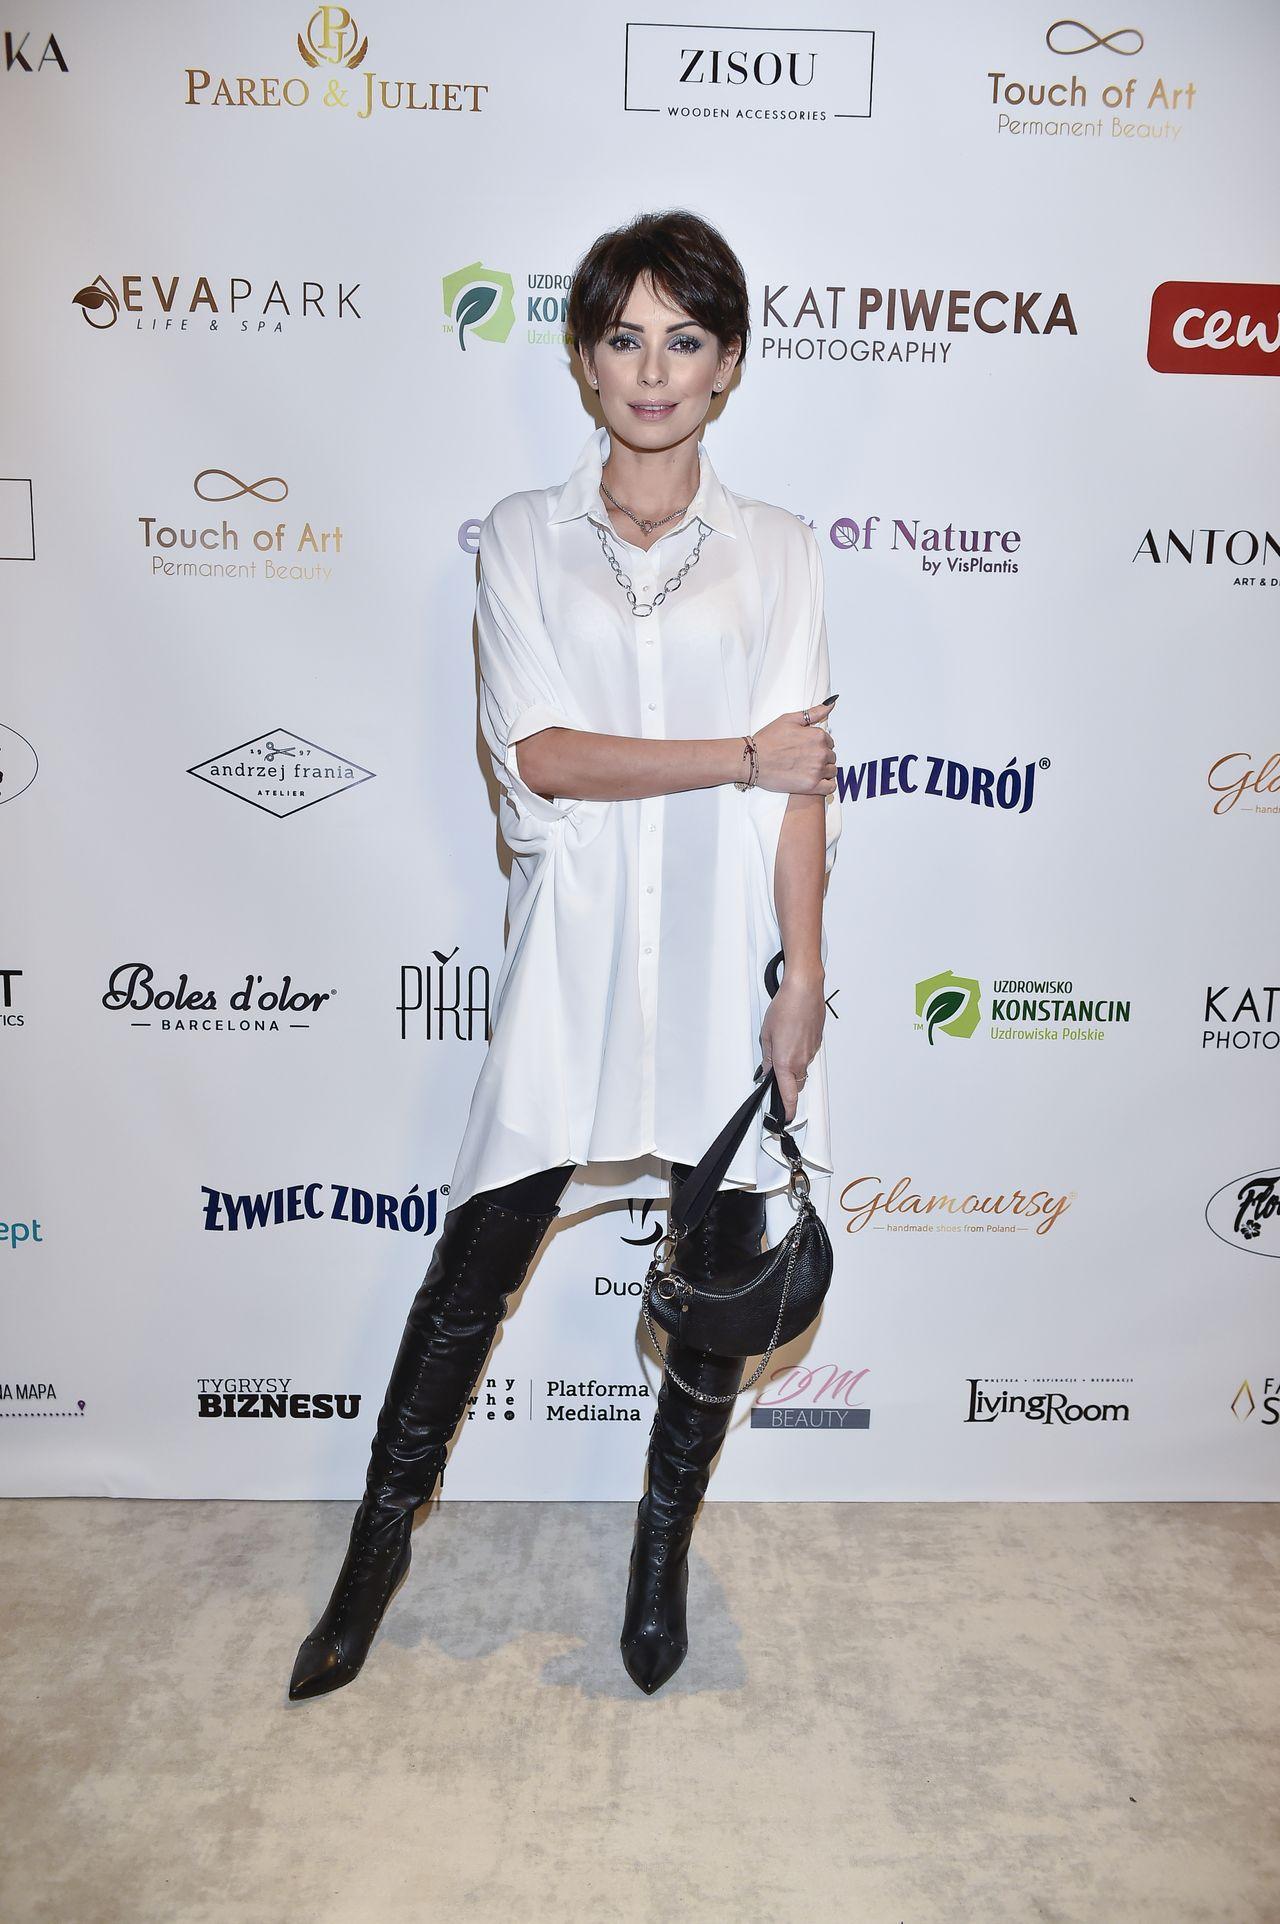 Elegancka Dorota Gardias na ściance.